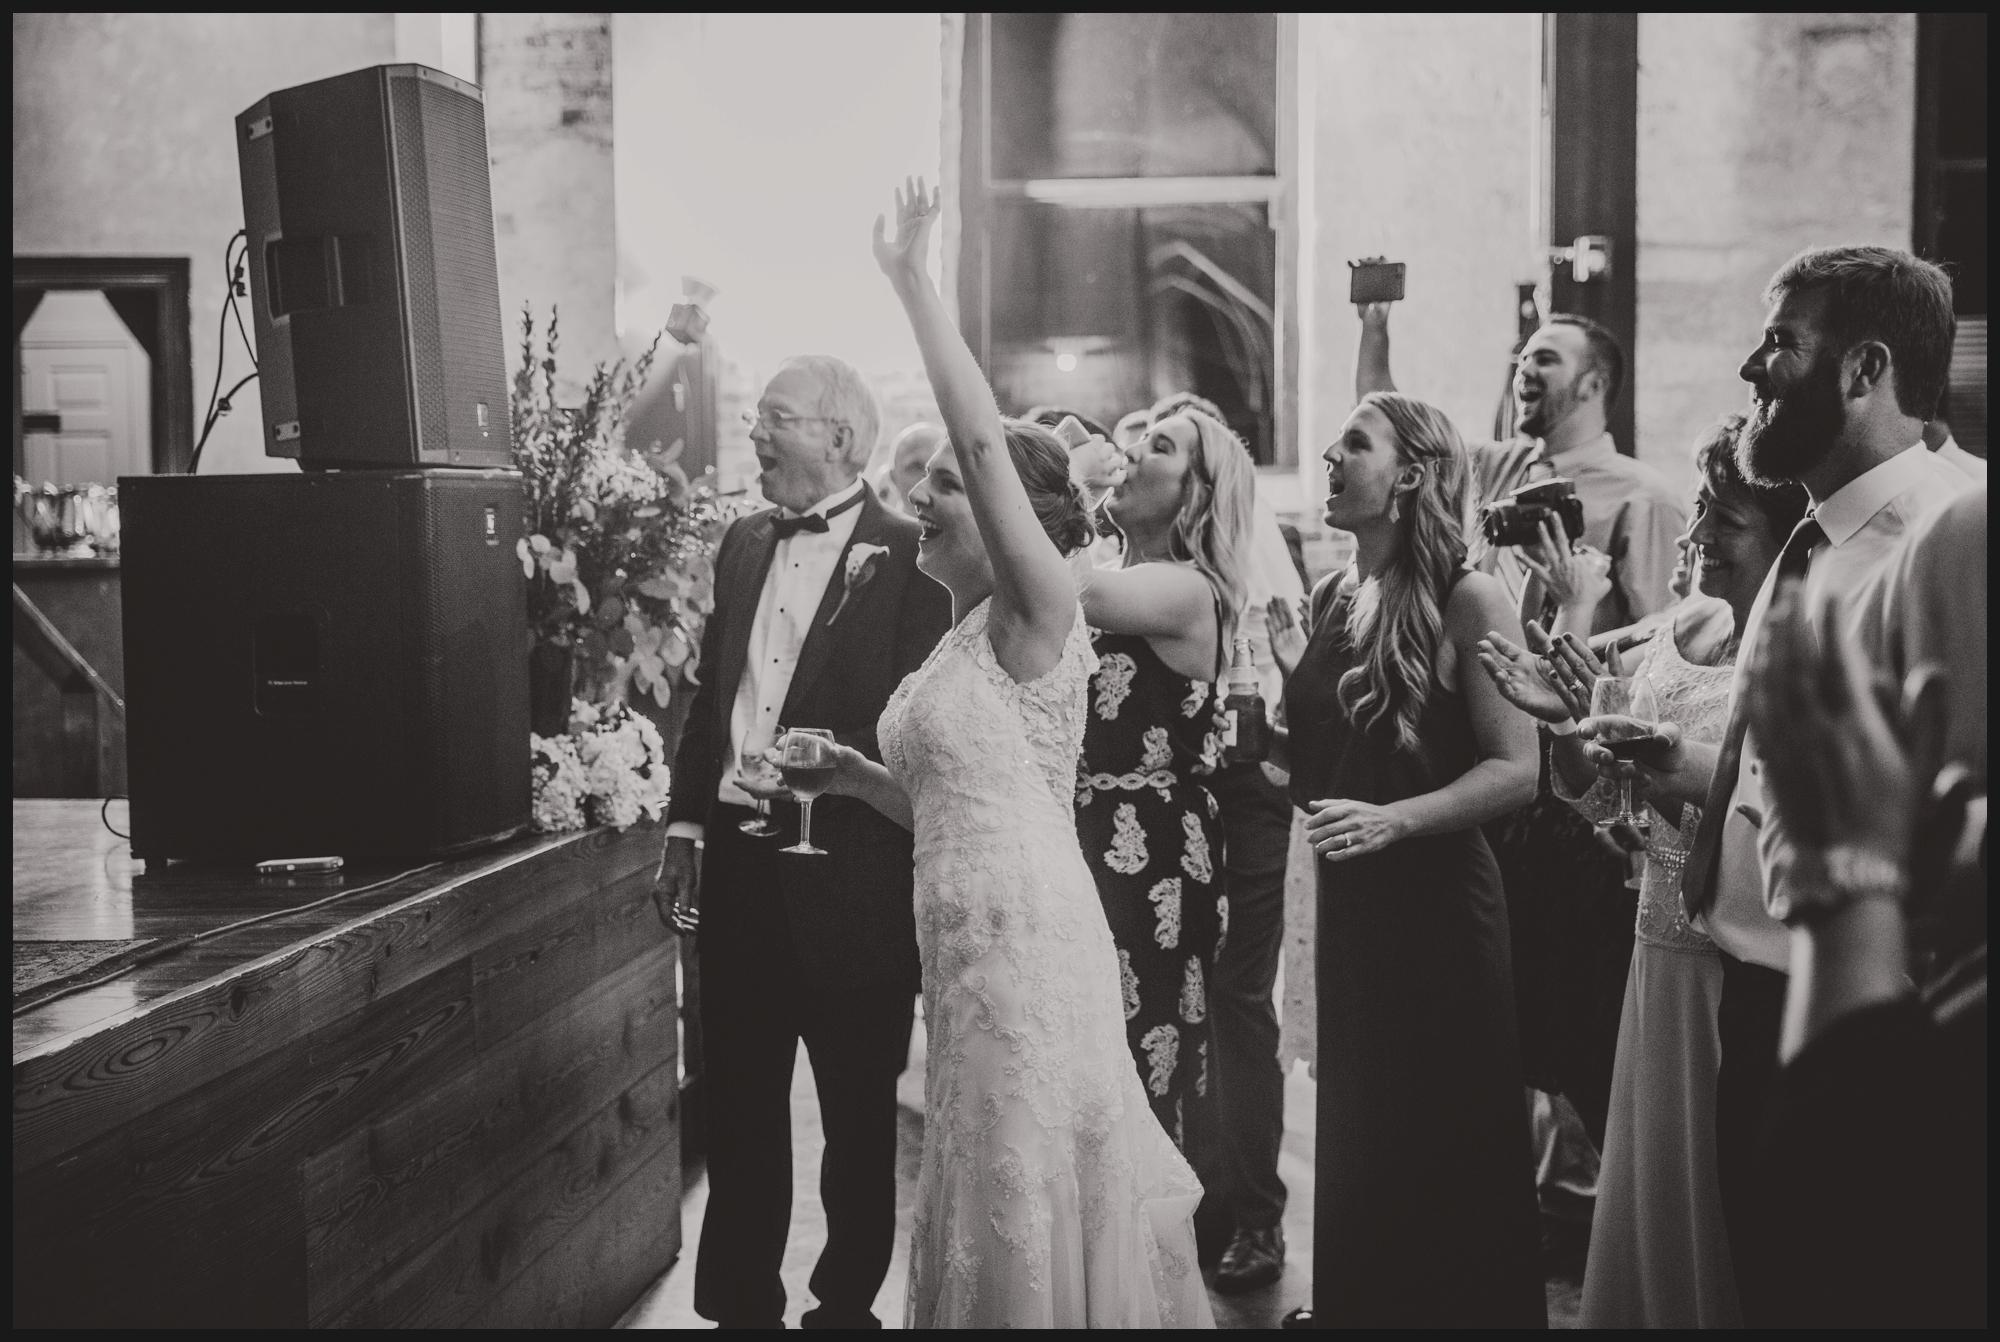 Orlando-Wedding-Photographer-destination-wedding-photographer-florida-wedding-photographer-bohemian-wedding-photographer_0666.jpg